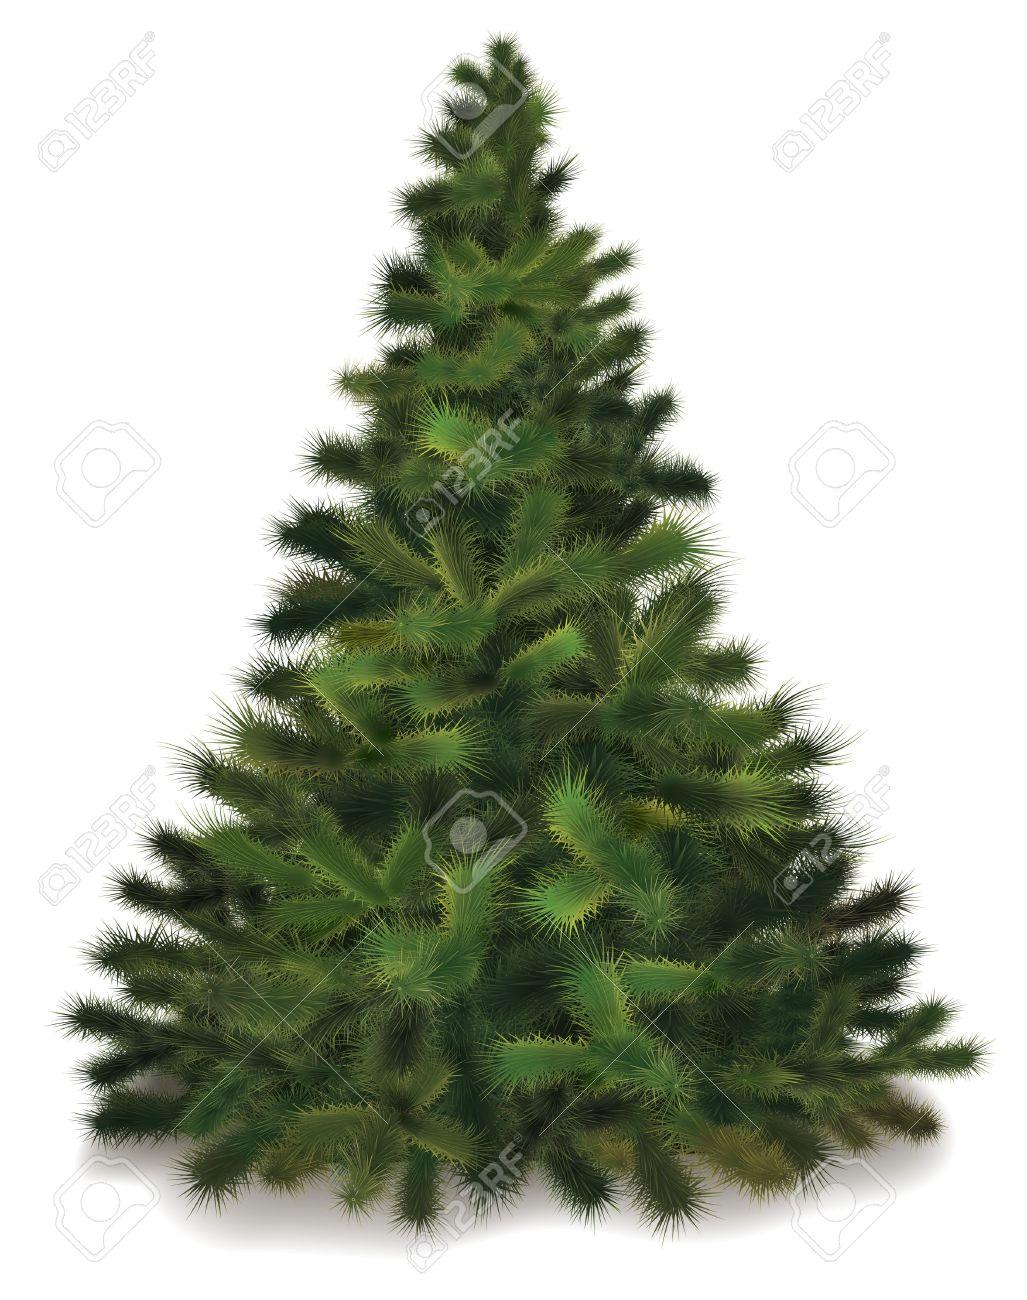 christmas tree realistic illustration of fluffy pine tree stock vector 11341334 - Realistic Christmas Trees